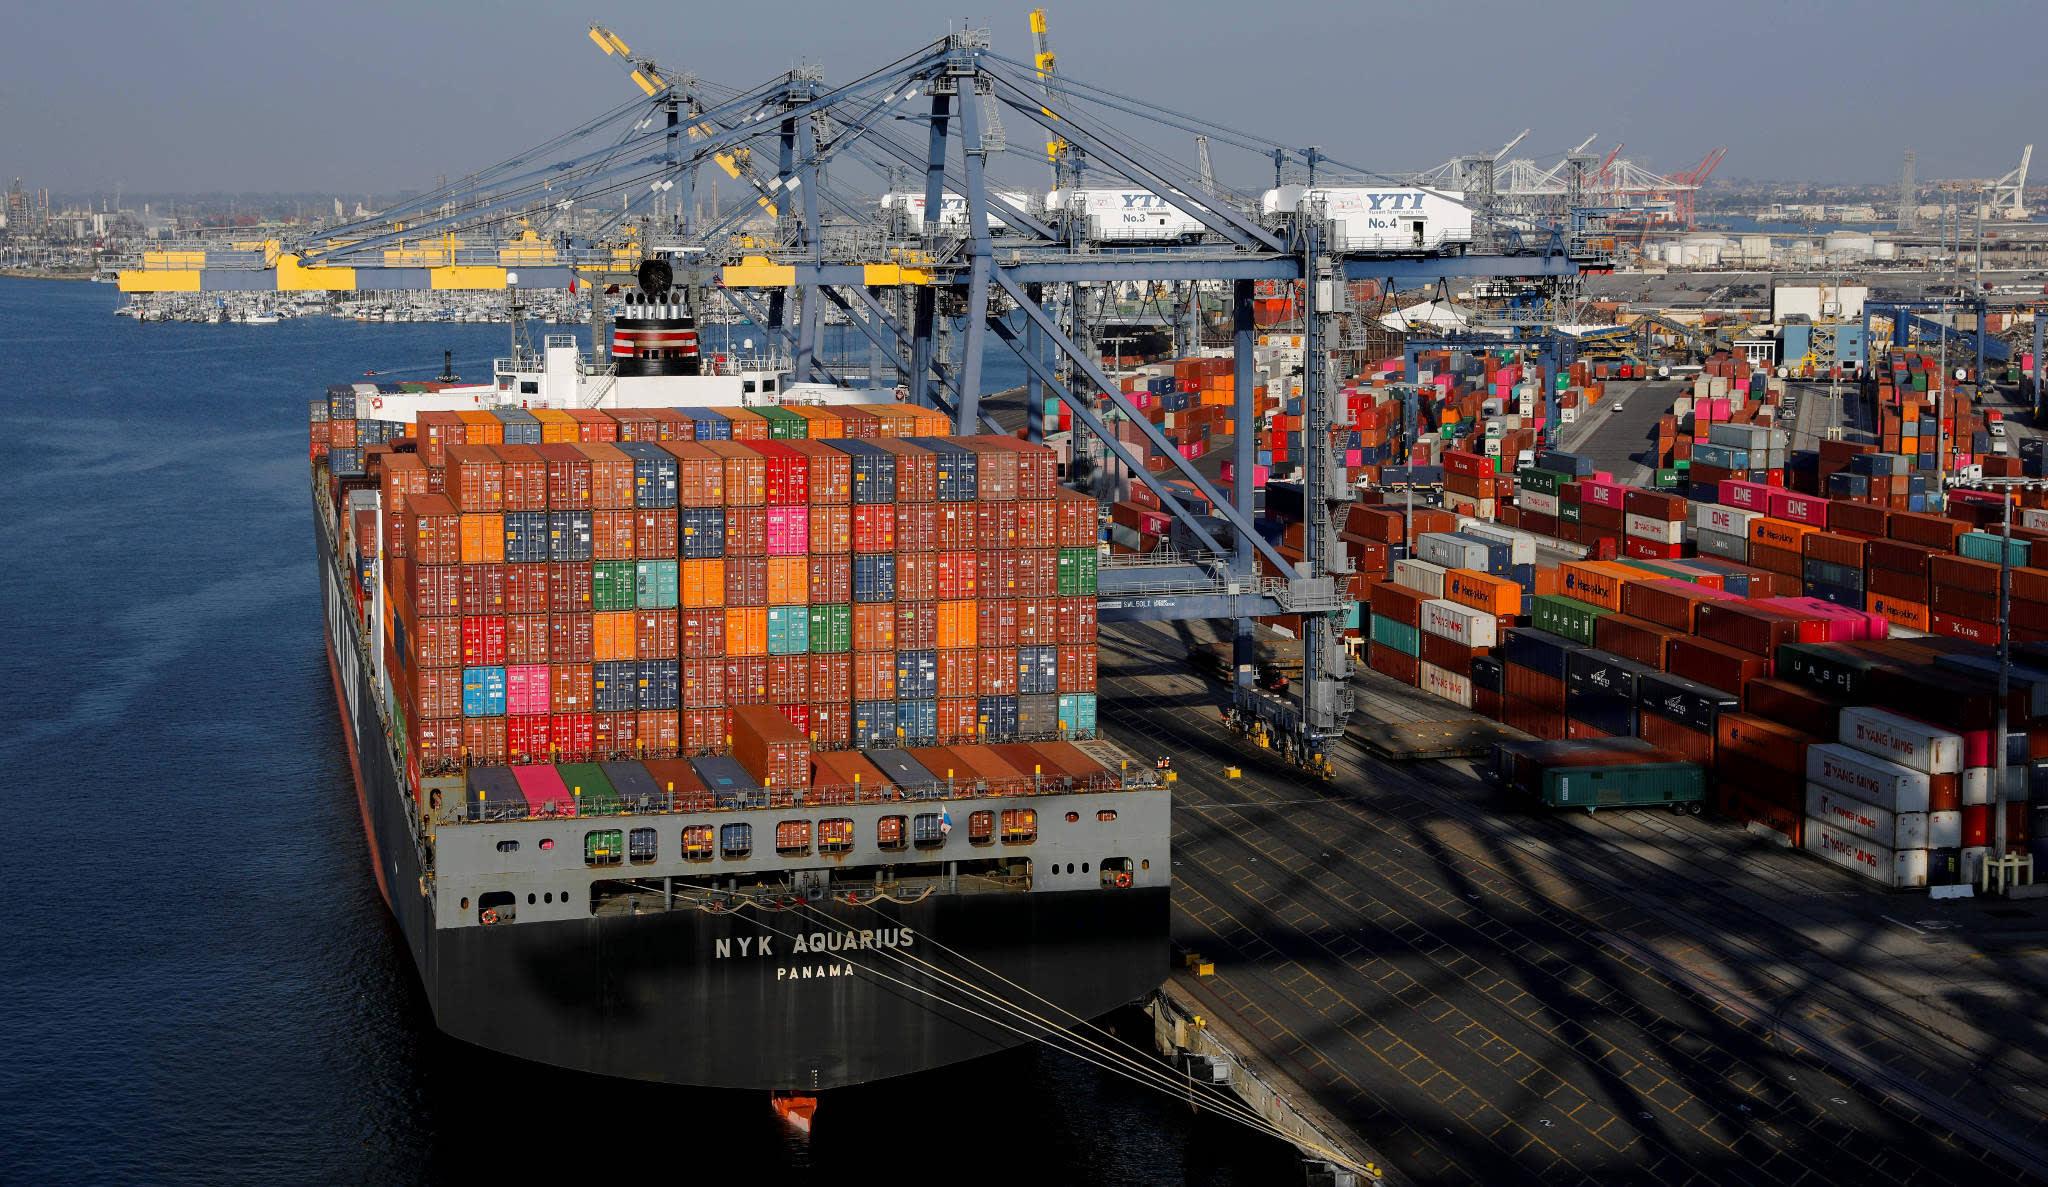 Emerging Asia bears brunt of global trade slowdown - Nikkei